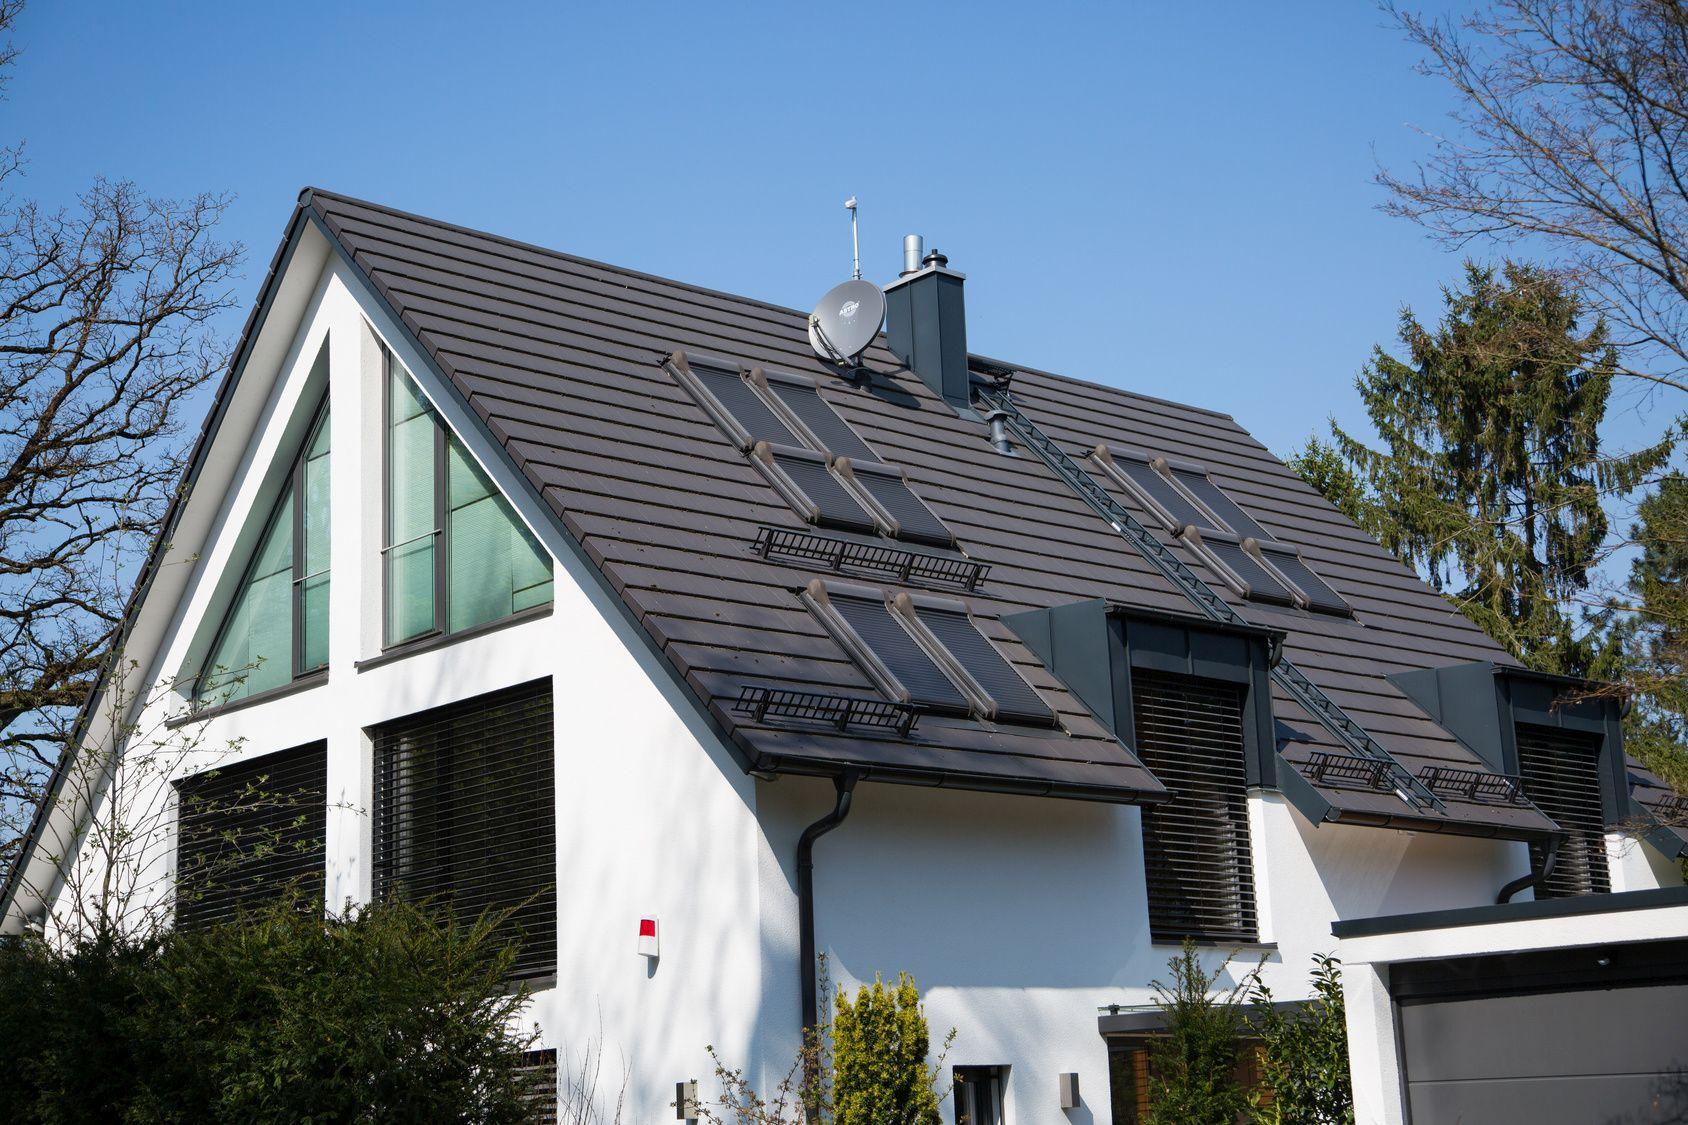 niedrigenergiehaus energiestandards im berblick. Black Bedroom Furniture Sets. Home Design Ideas